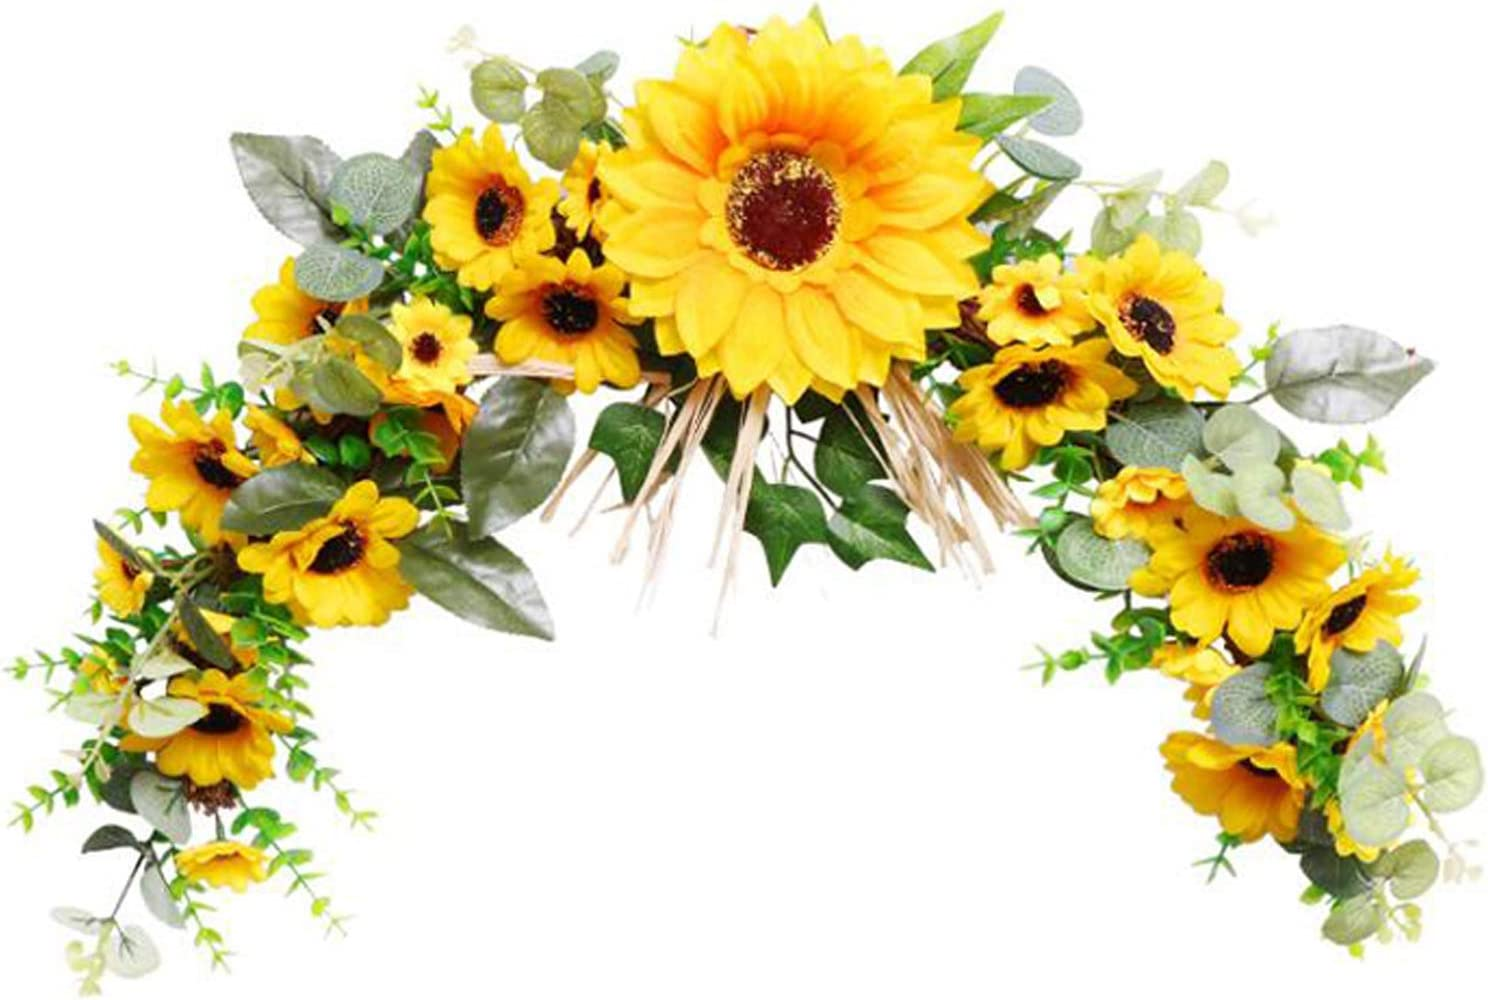 GWOKWAI Artificial Sunflower Swags for Front Door Decor, Wall Hanging Sunflower Flower Wreath for Home Arch Door Wall Office Wedding Decor